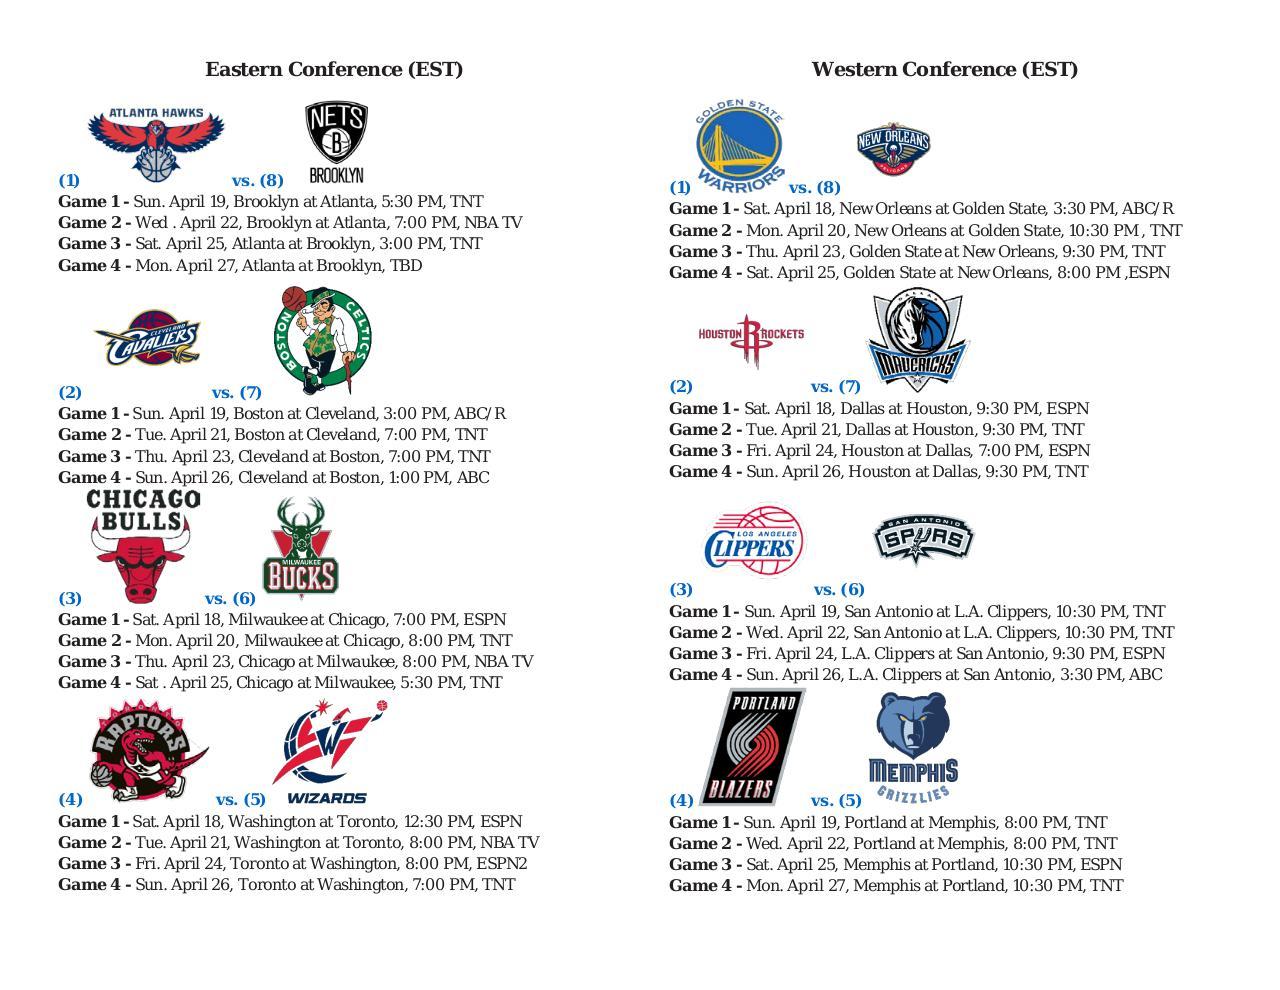 Nba playoff dates 2015